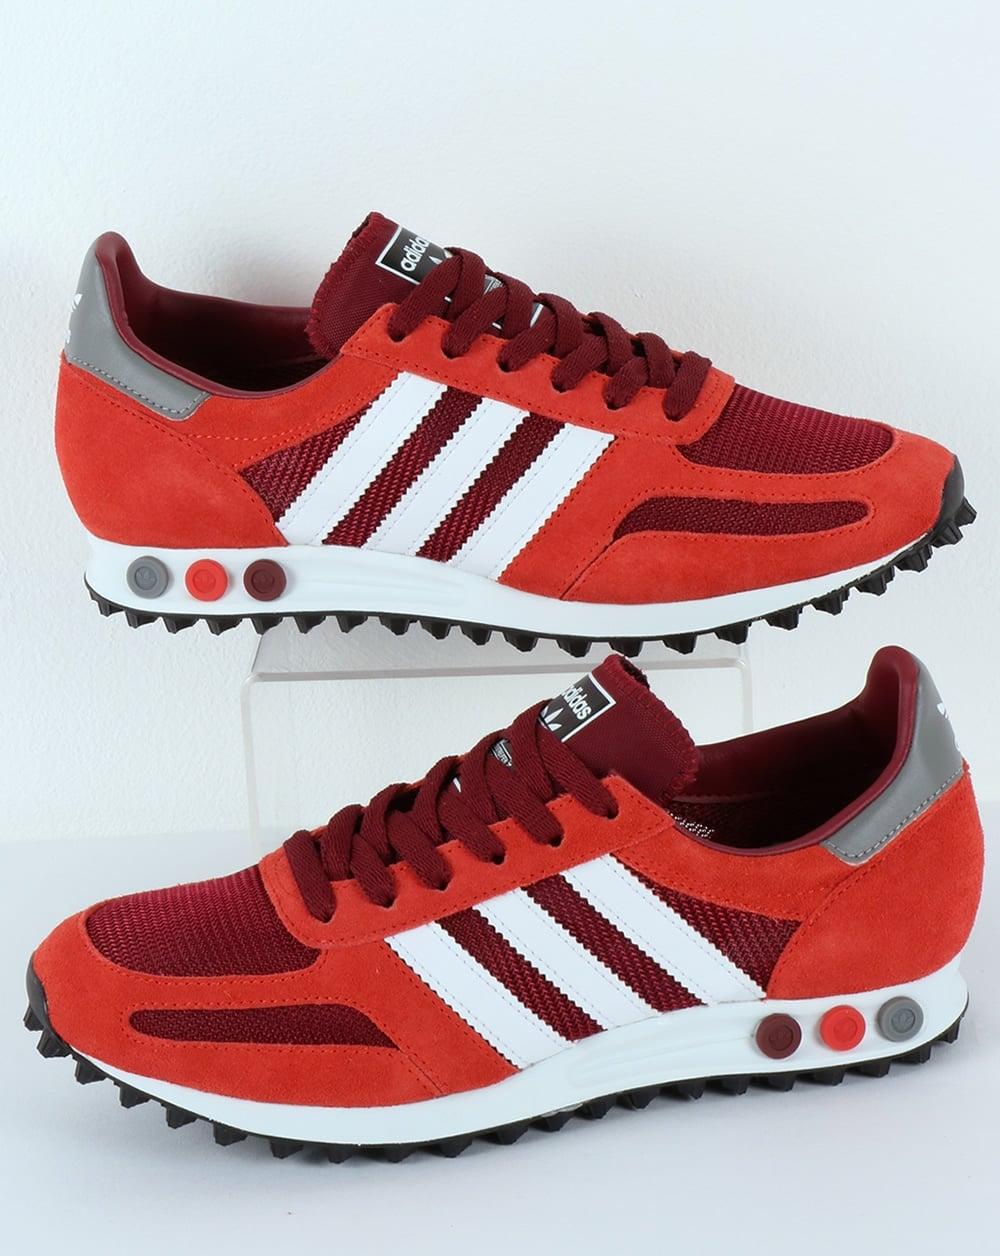 pretty nice b9880 7f2bb adidas Trainers Adidas LA Trainer OG Burgundy Red